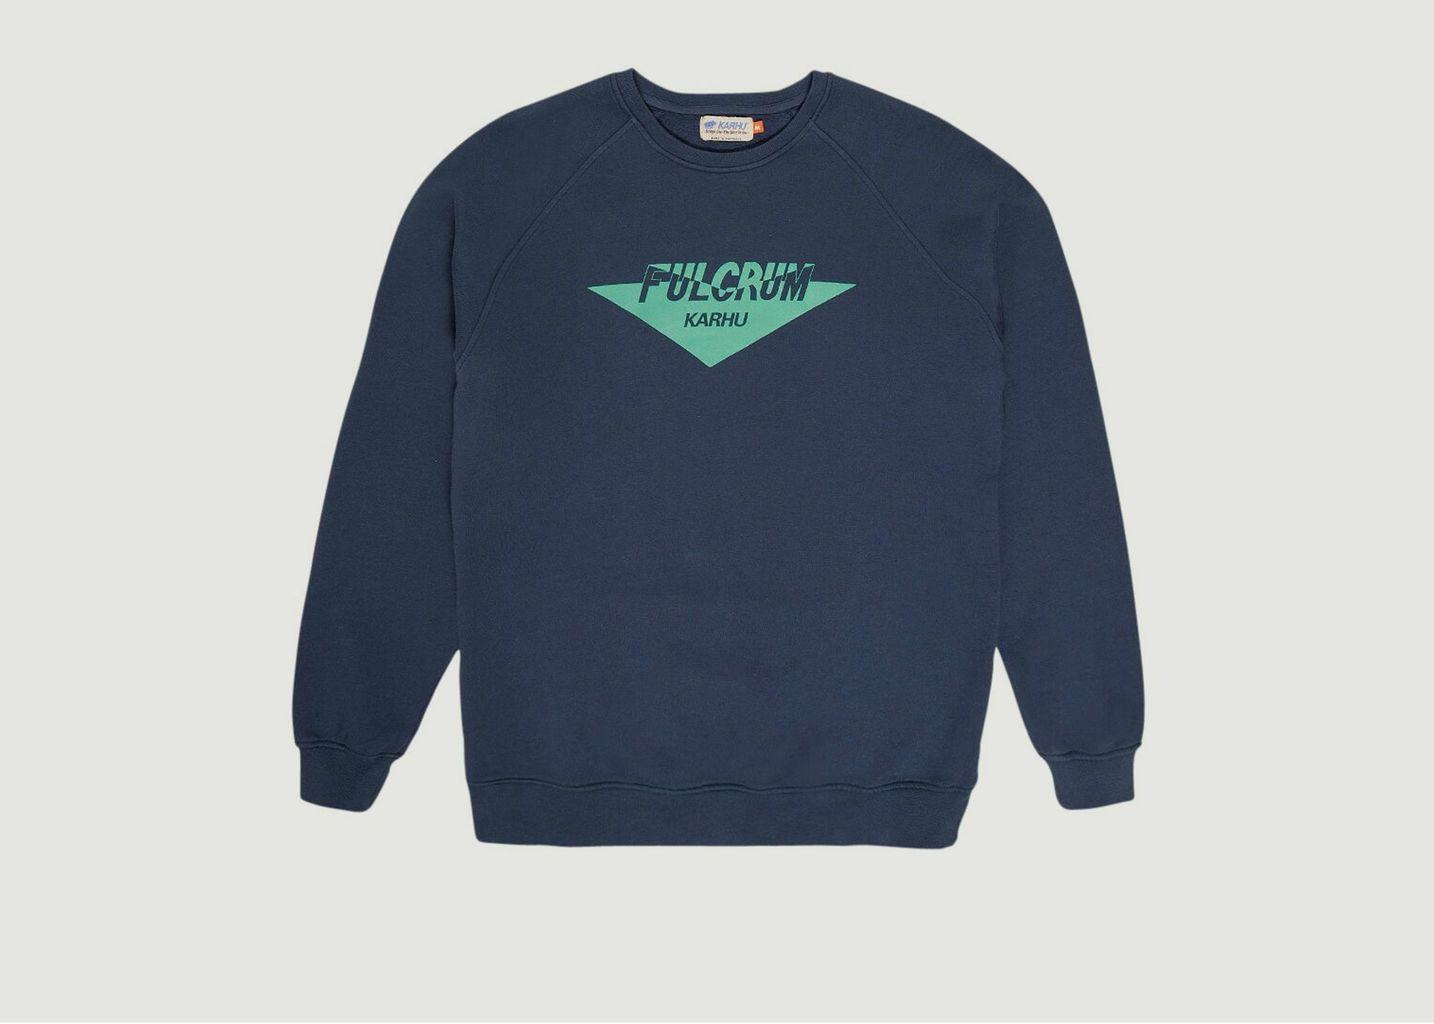 Sweatshirt Fulcrum - Karhu